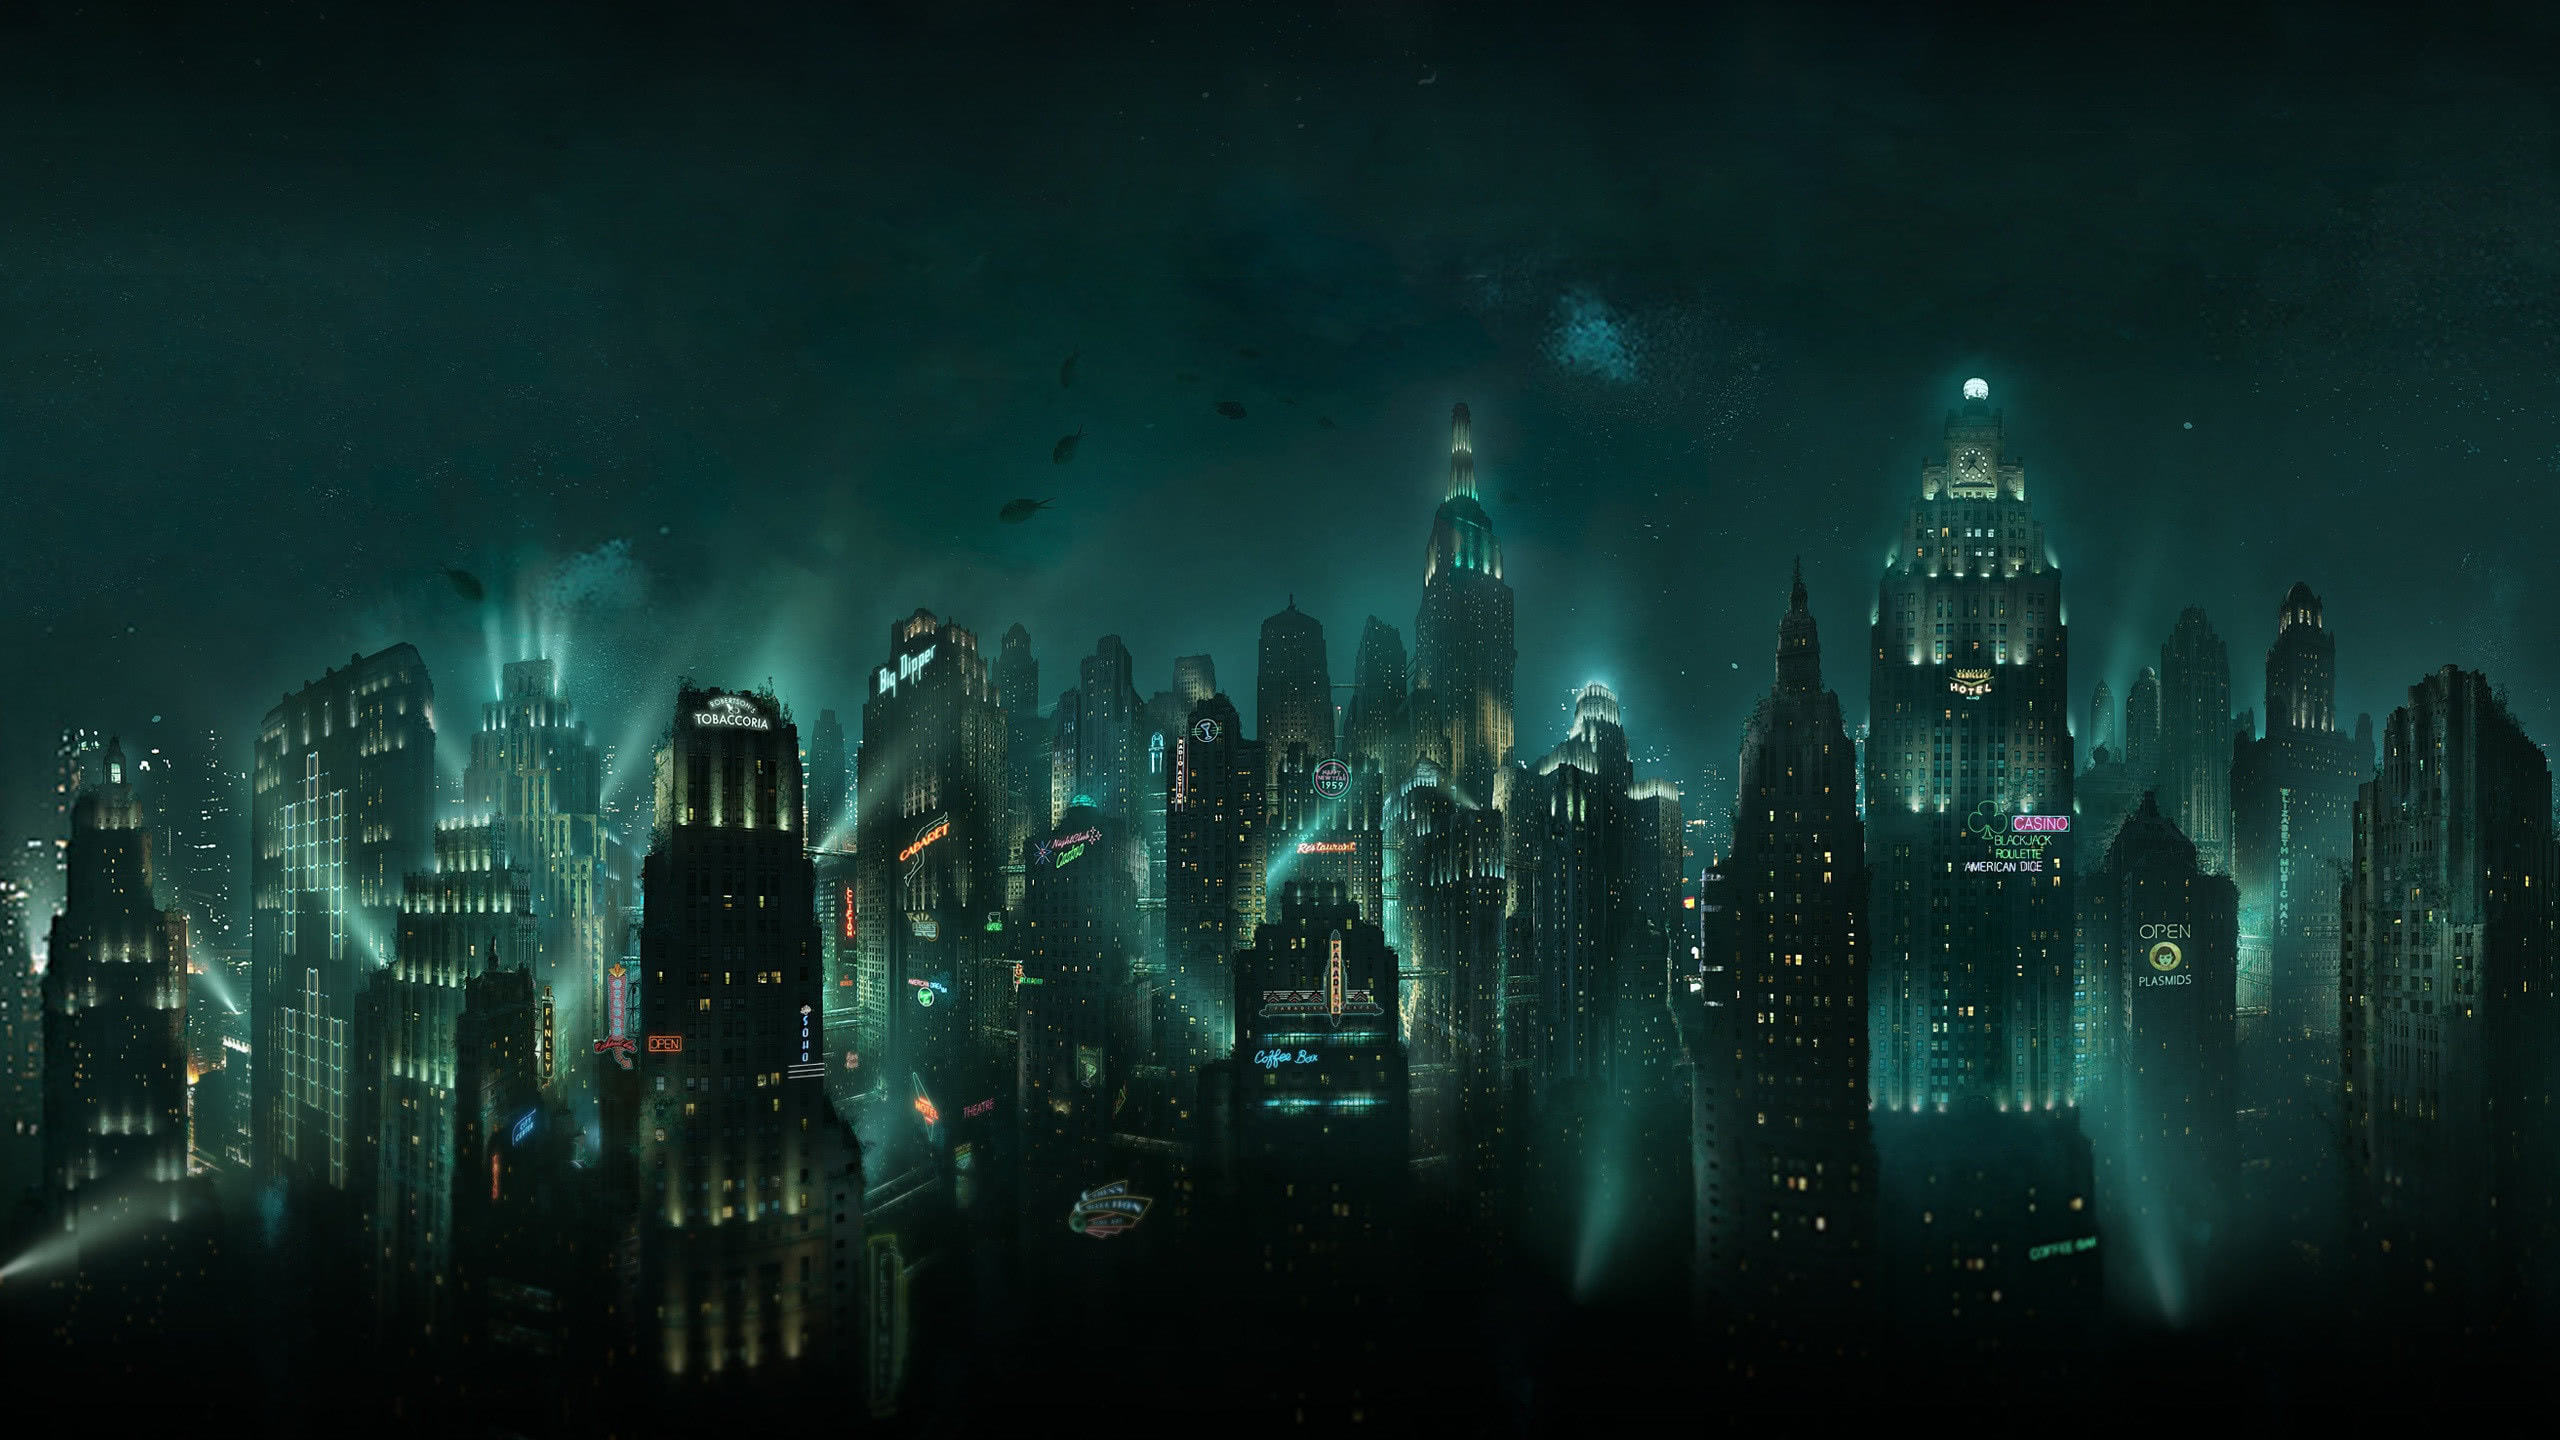 bioshock rapture city wqhd 1440p wallpaper